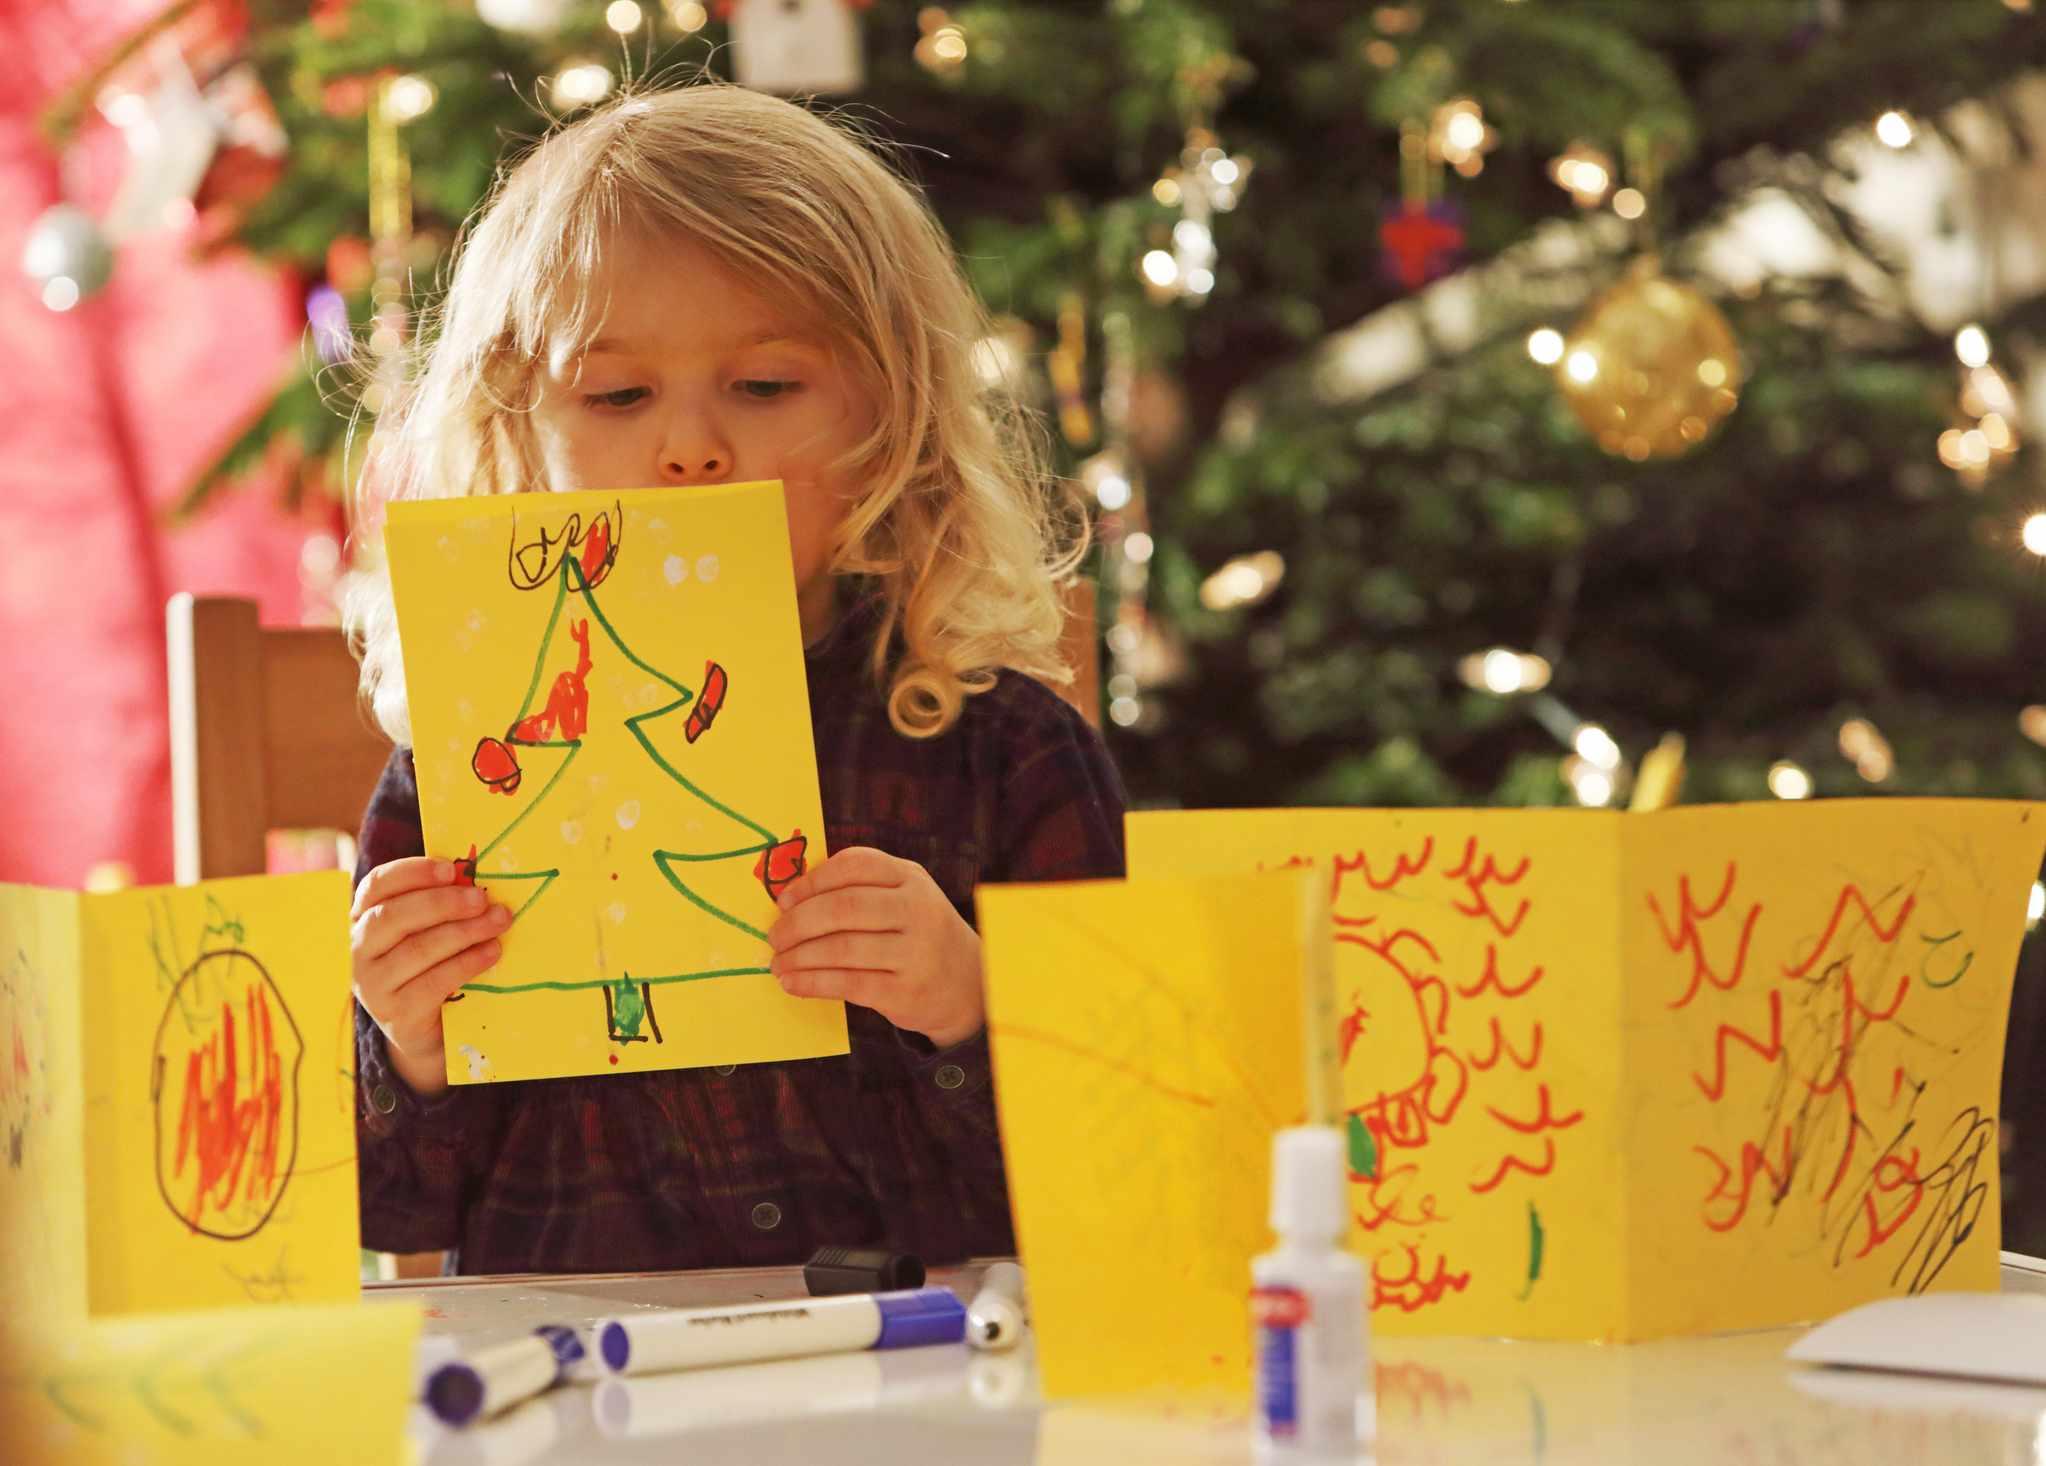 Young girl making homemade Christmas cards